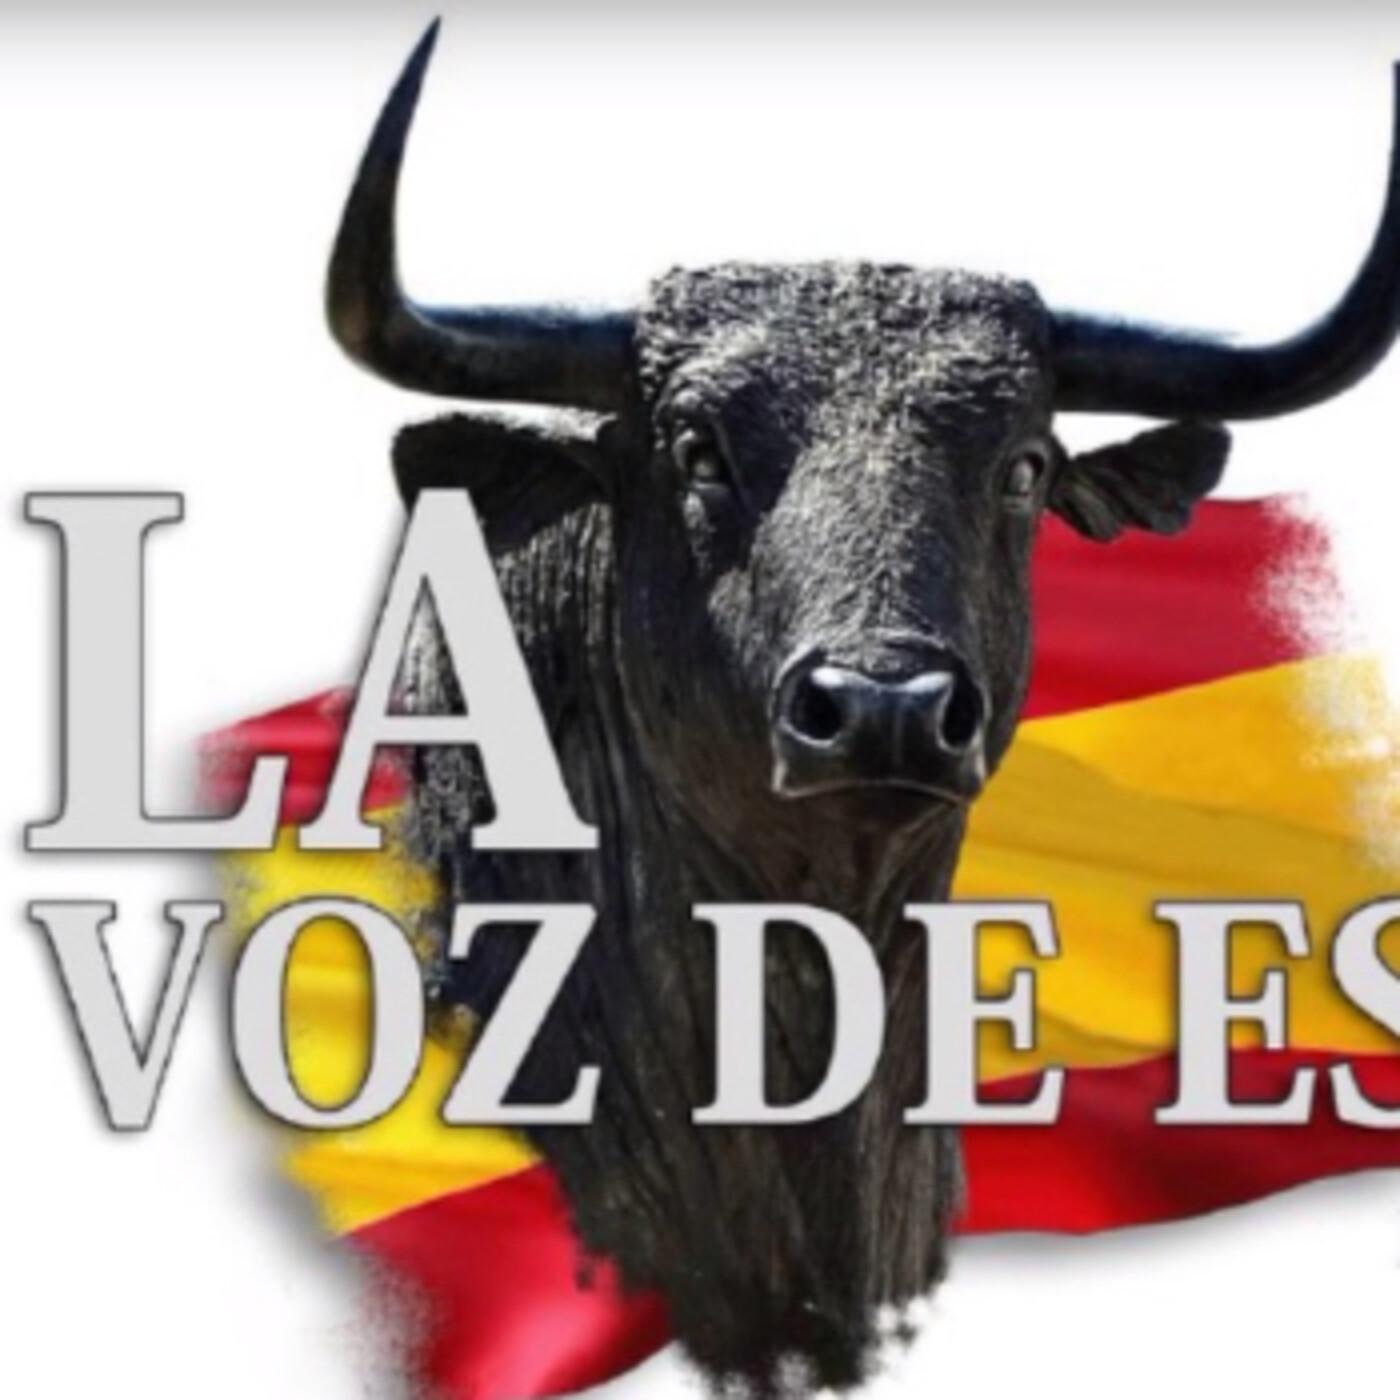 LA VOZ DE ESPAÑA Ed: 252 (25 de Junio)